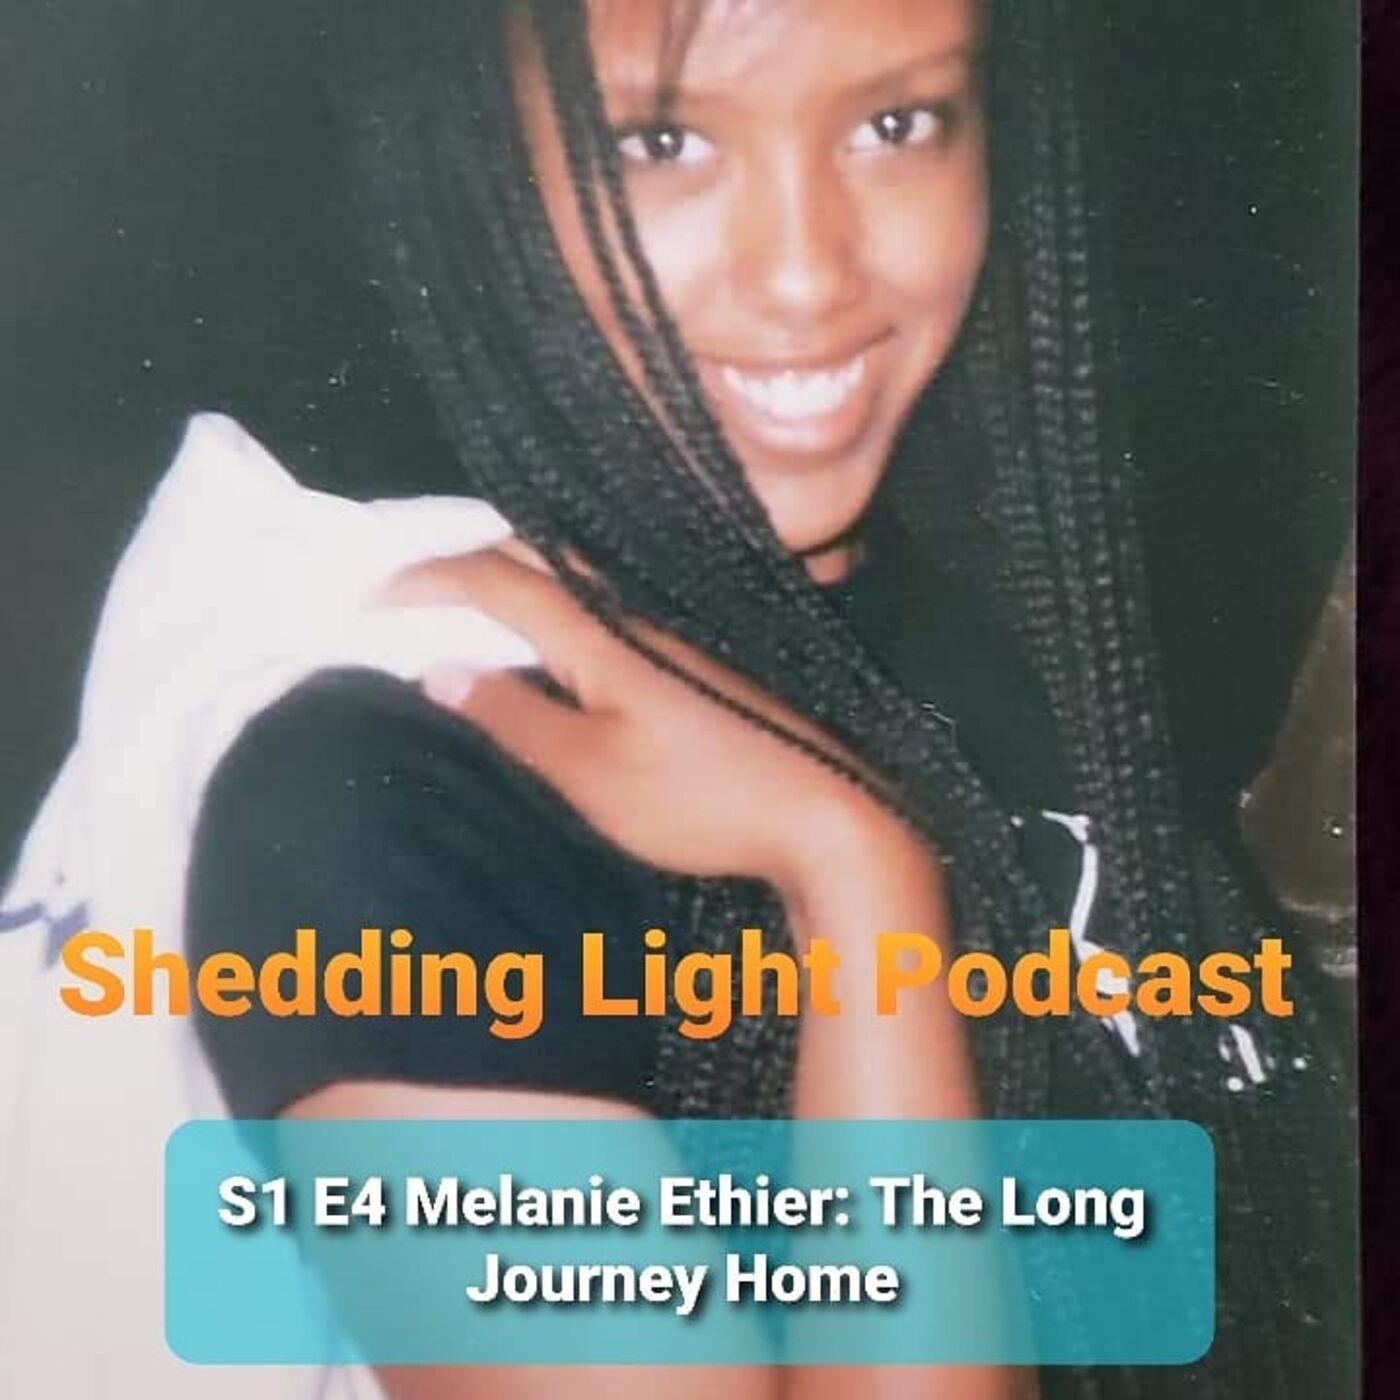 S1 E4 Melanie Ethier - The Long Journey Home